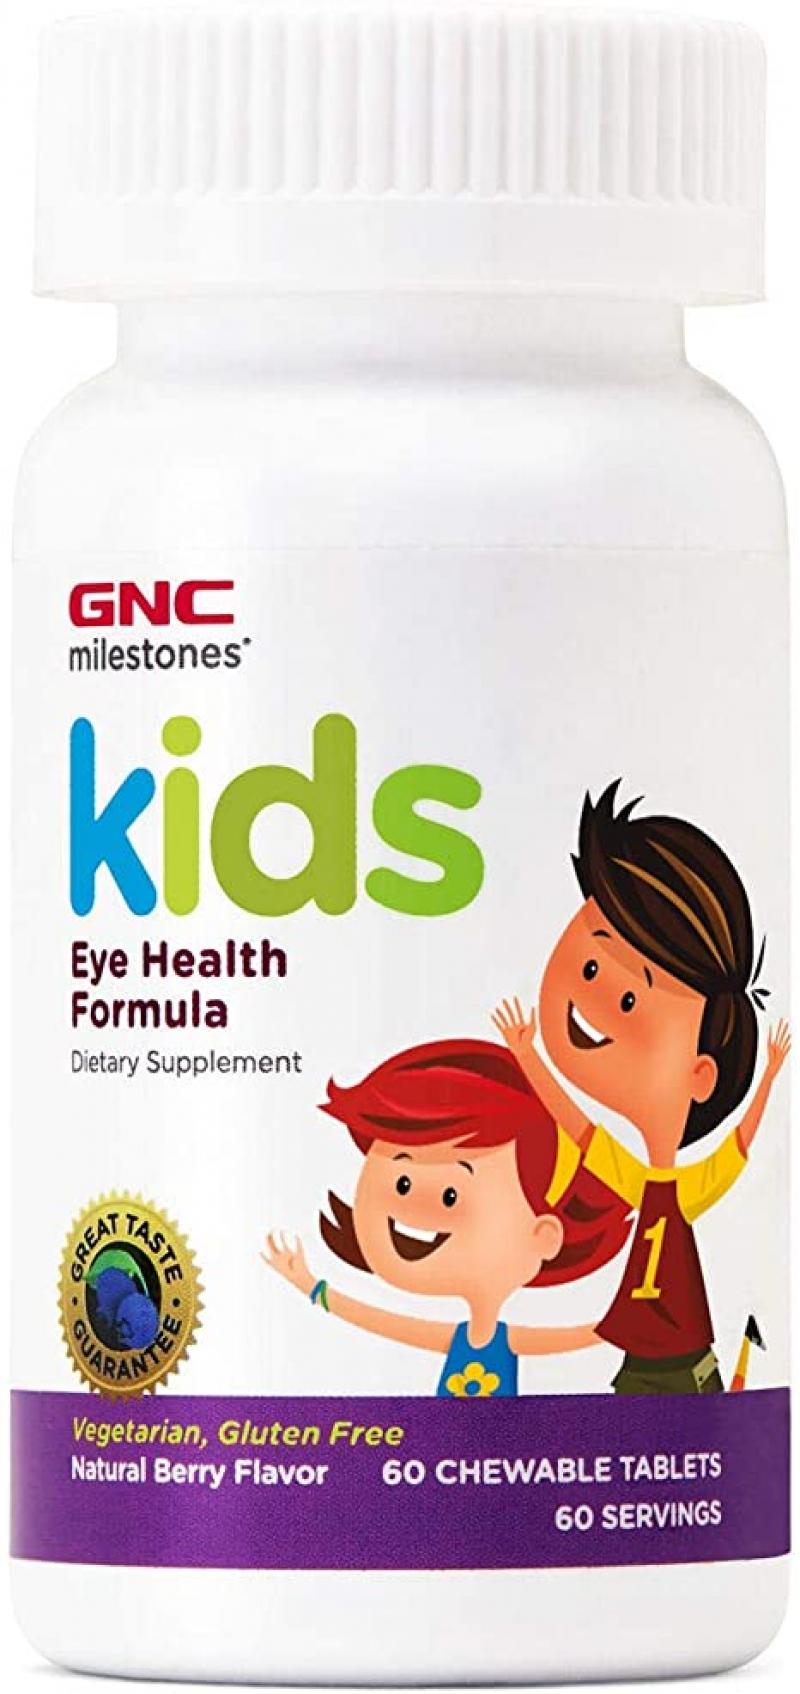 ihocon: GNC Milestones Kids Eye Health Formula, 60 Chewable Tablets, Supports Eye and Vision Health 兒童眼睛保健補充品